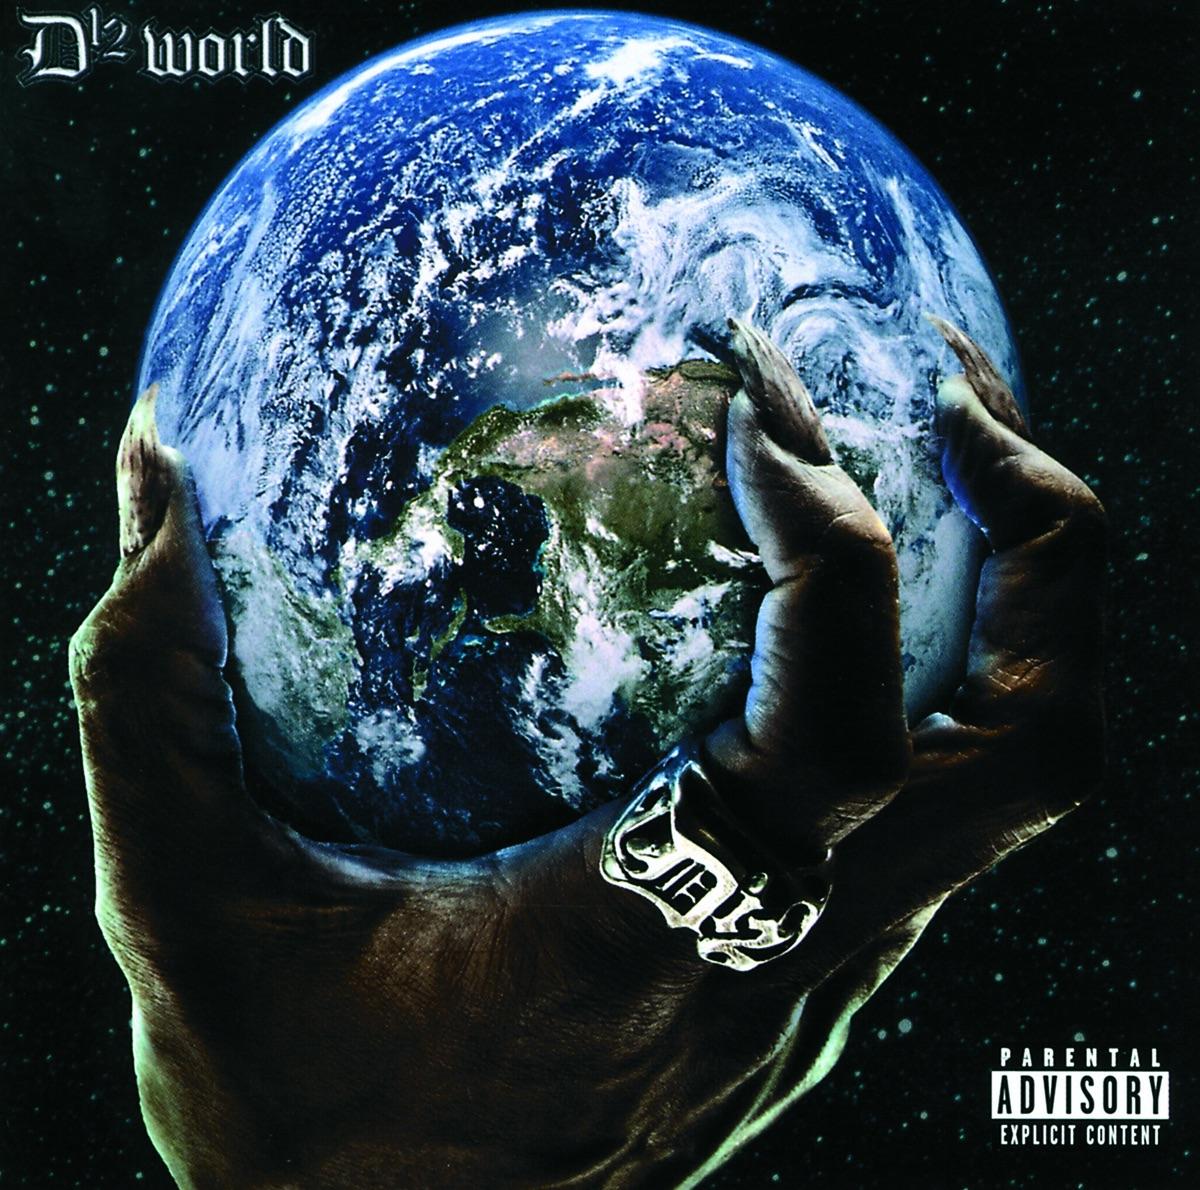 D12 World D12 CD cover